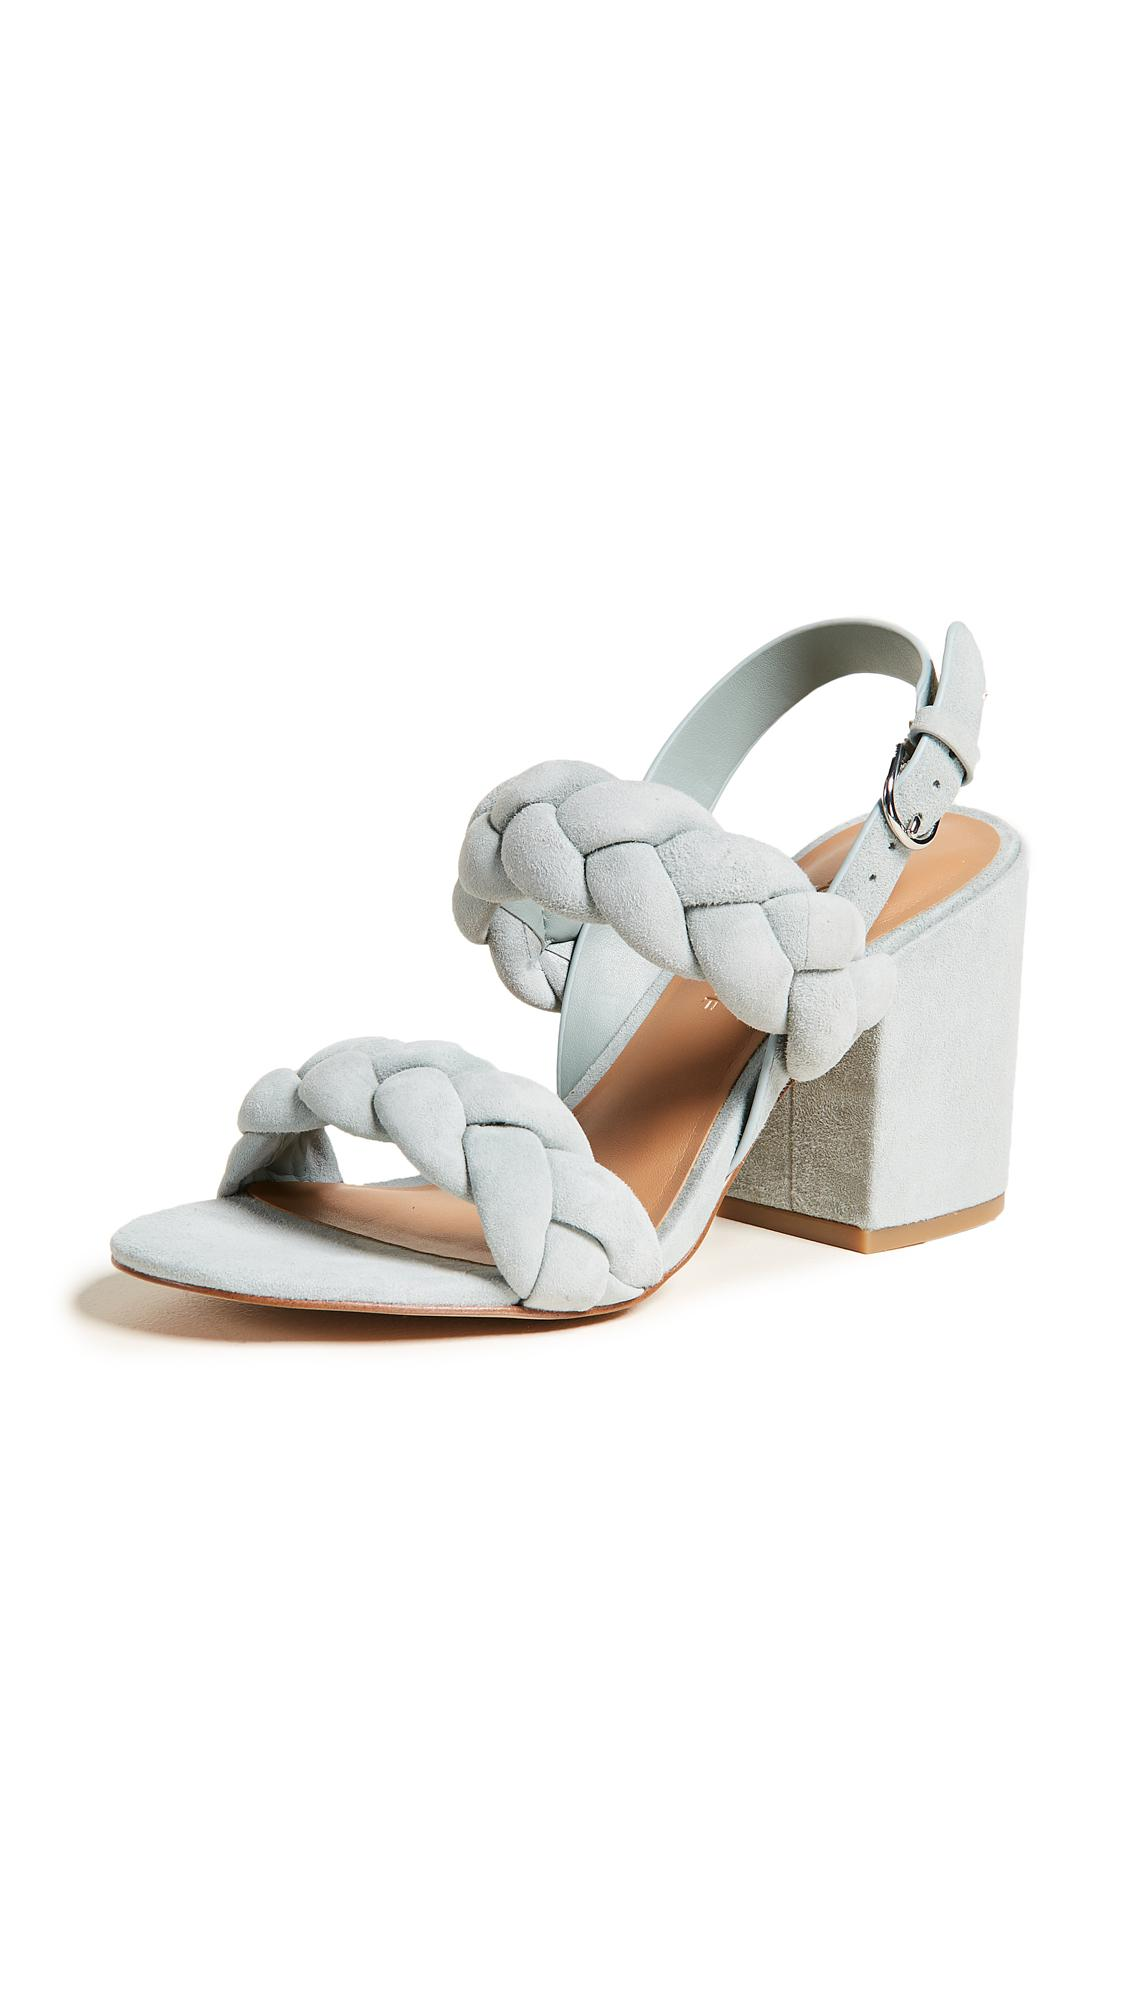 7f1d439d3f6 Lyst - Rebecca Minkoff Candace Braided Sandals